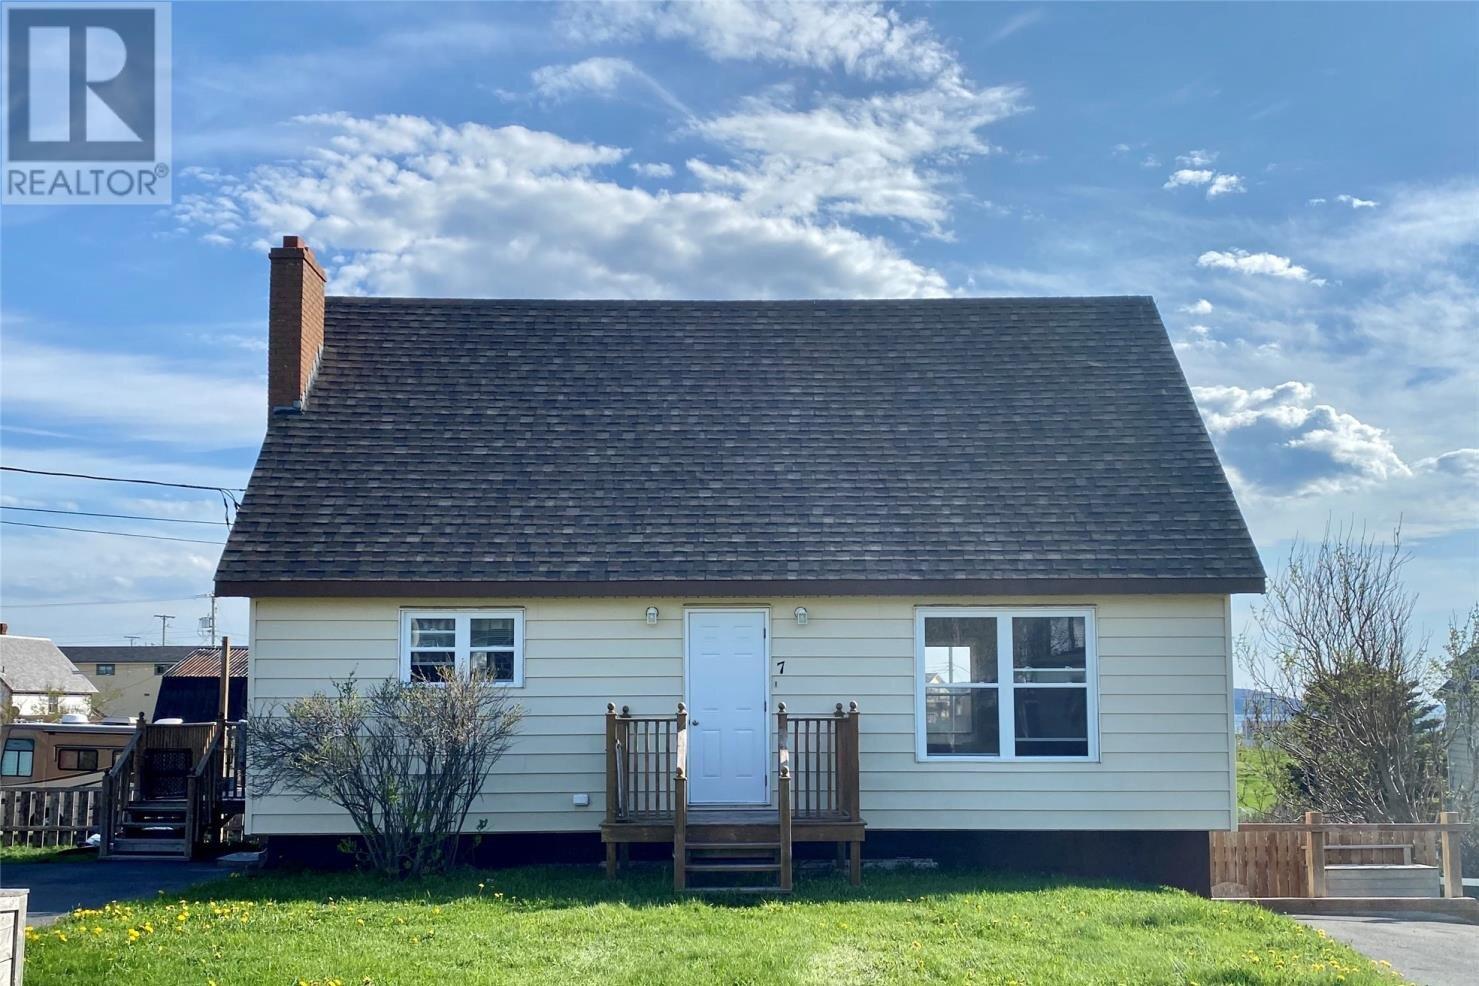 House for sale at 7 Humby's Ln Bonavista Newfoundland - MLS: 1211872